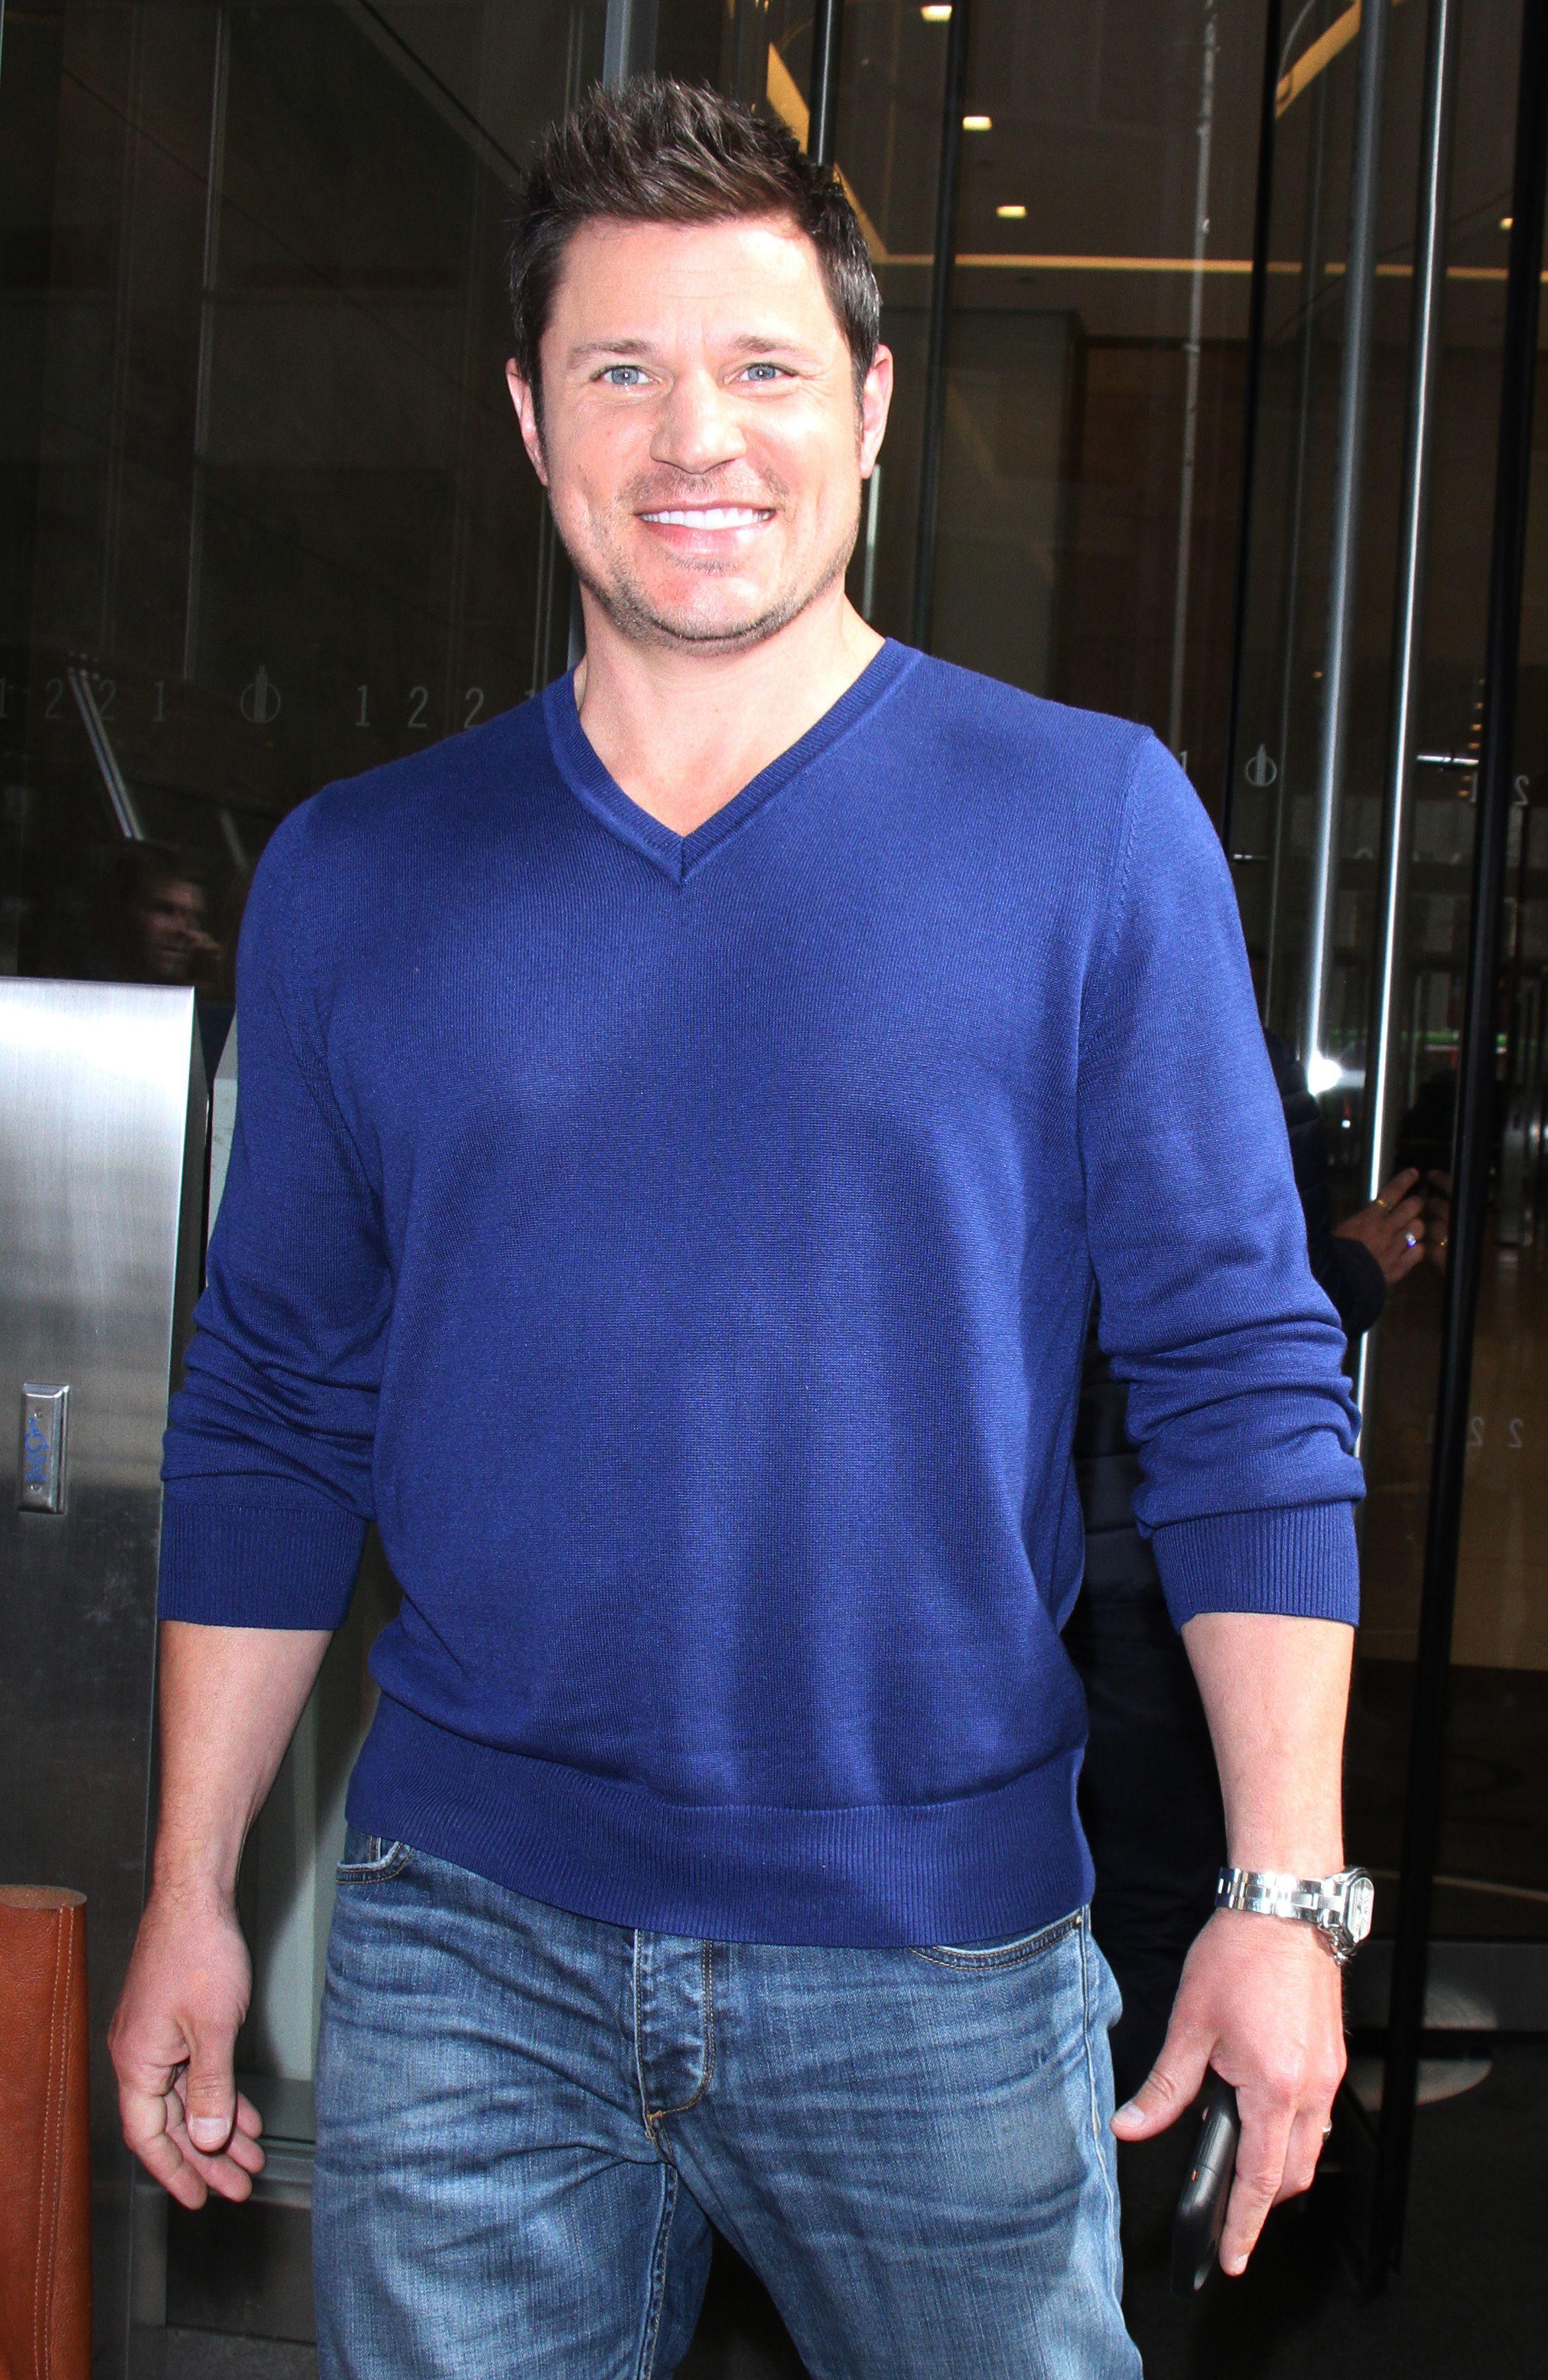 Nick Lachey leaves SiriusXM Studios in New York City on April 5, 2017.